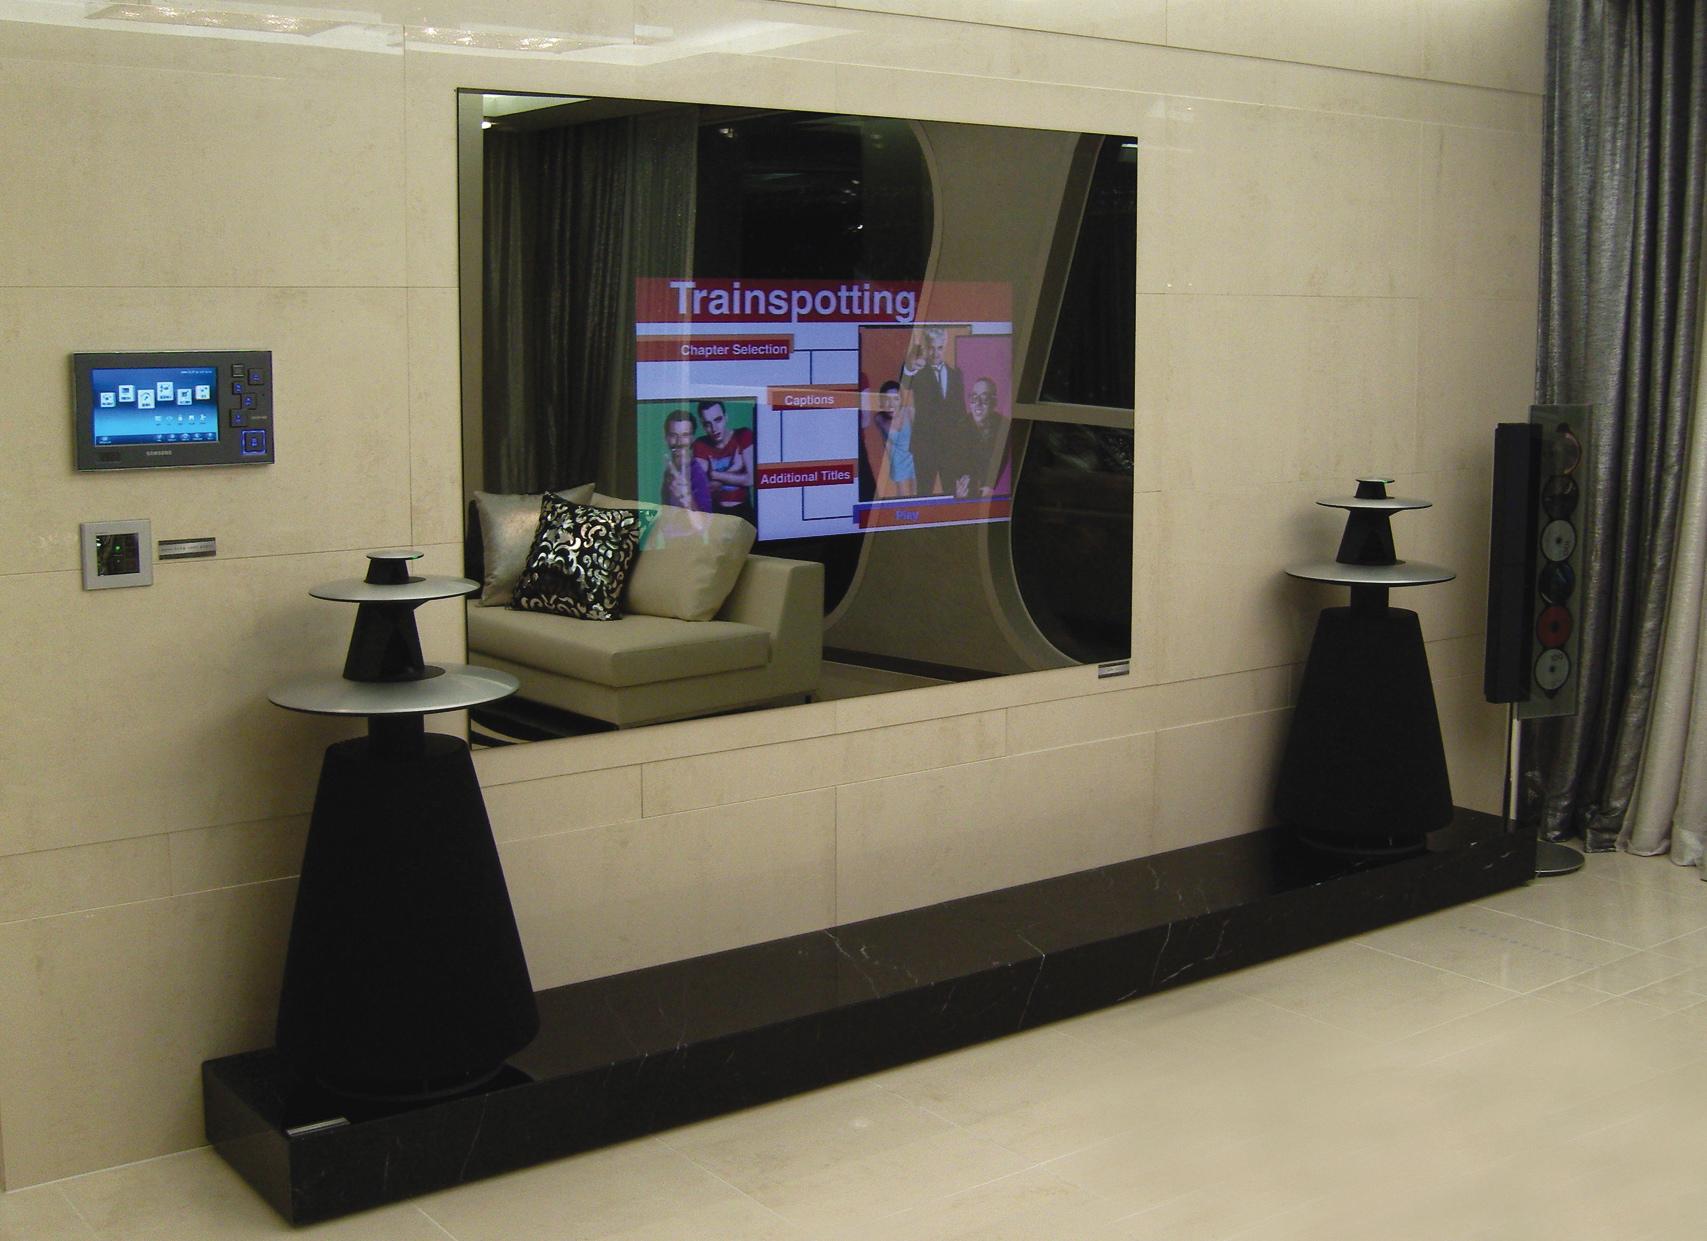 Телевизор за зеркалом своими руками